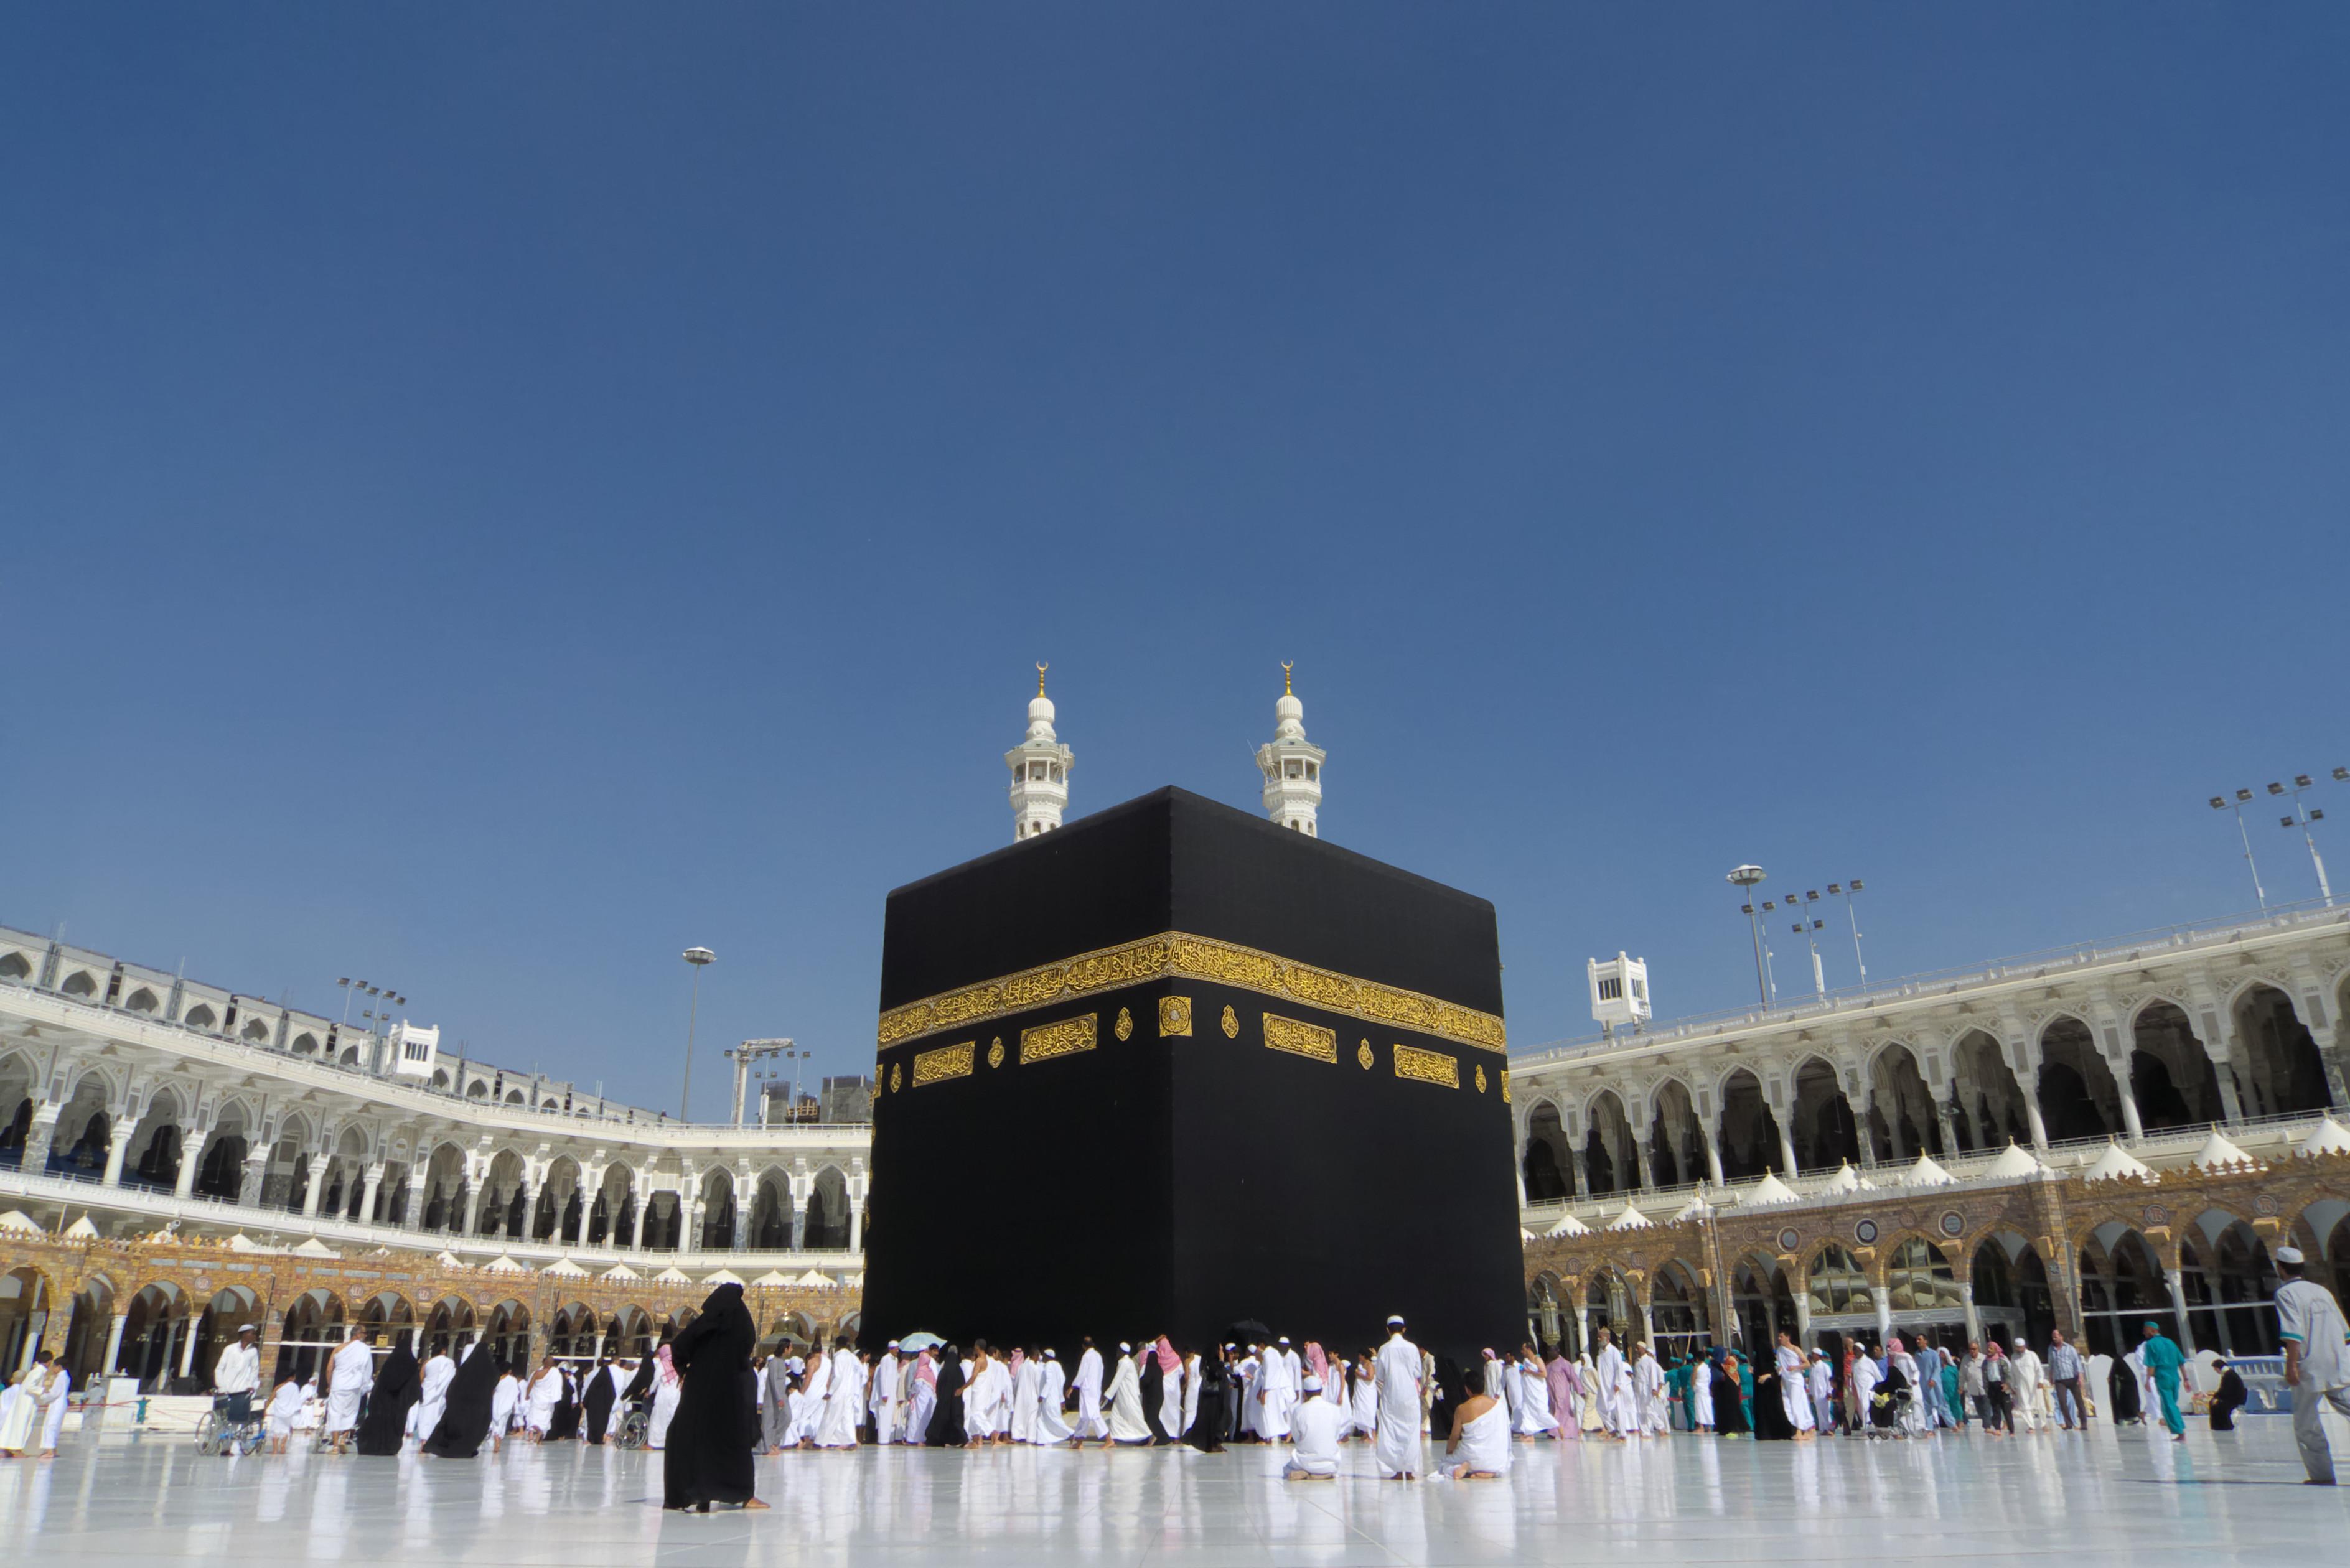 kaaba-mecca-wallpaper-roee0x7h-e1392361502768